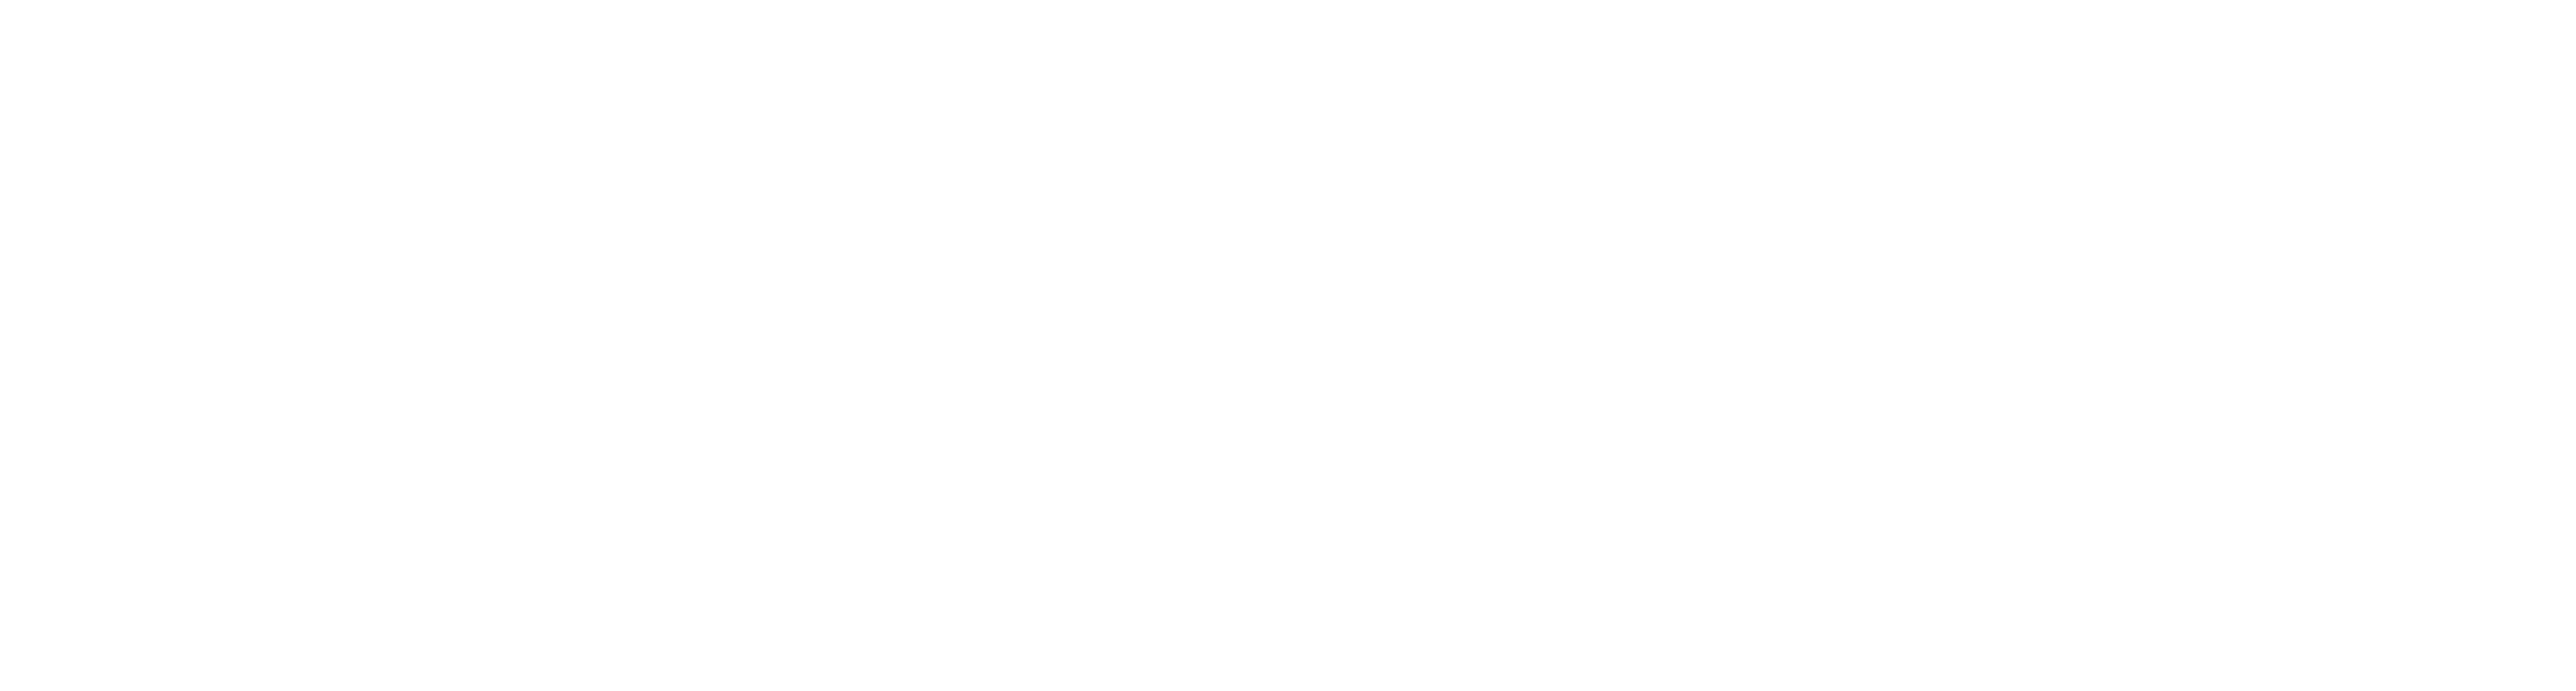 SoulRnb2017